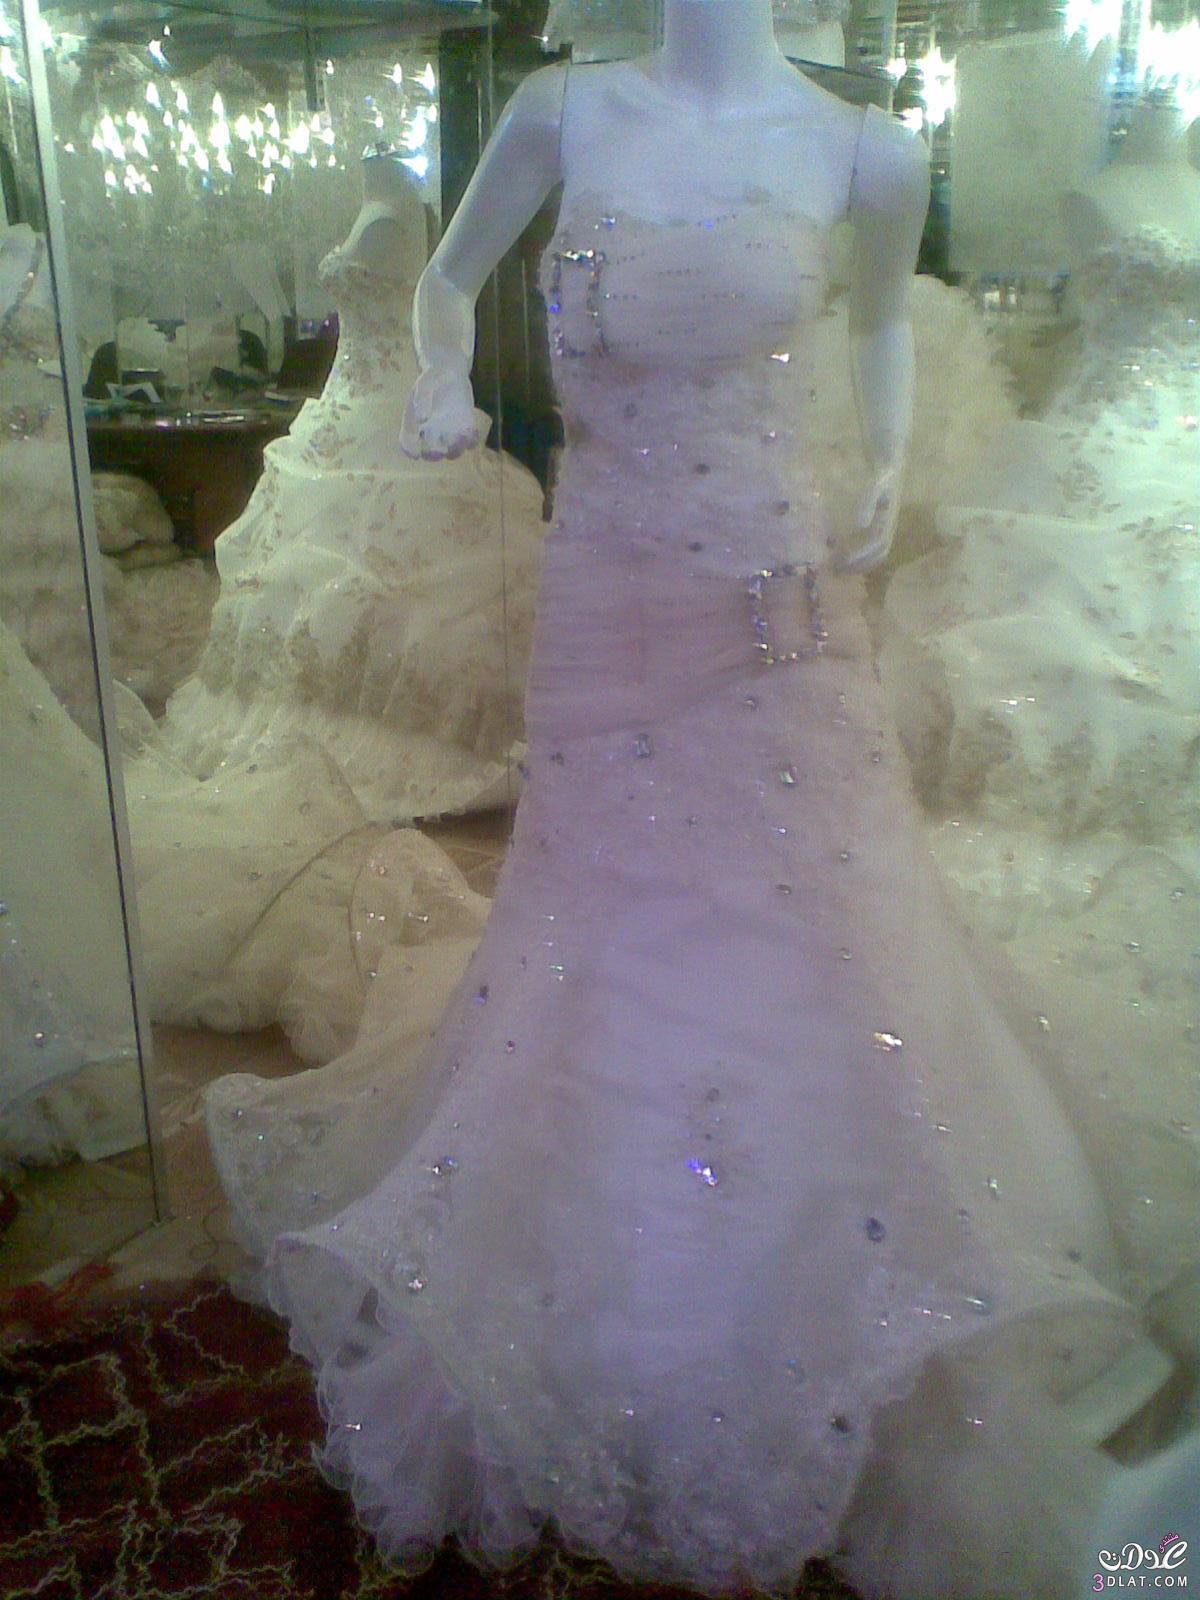 فساتين زفاف2019فساتين افراح حصريا لعرائس الجزائر